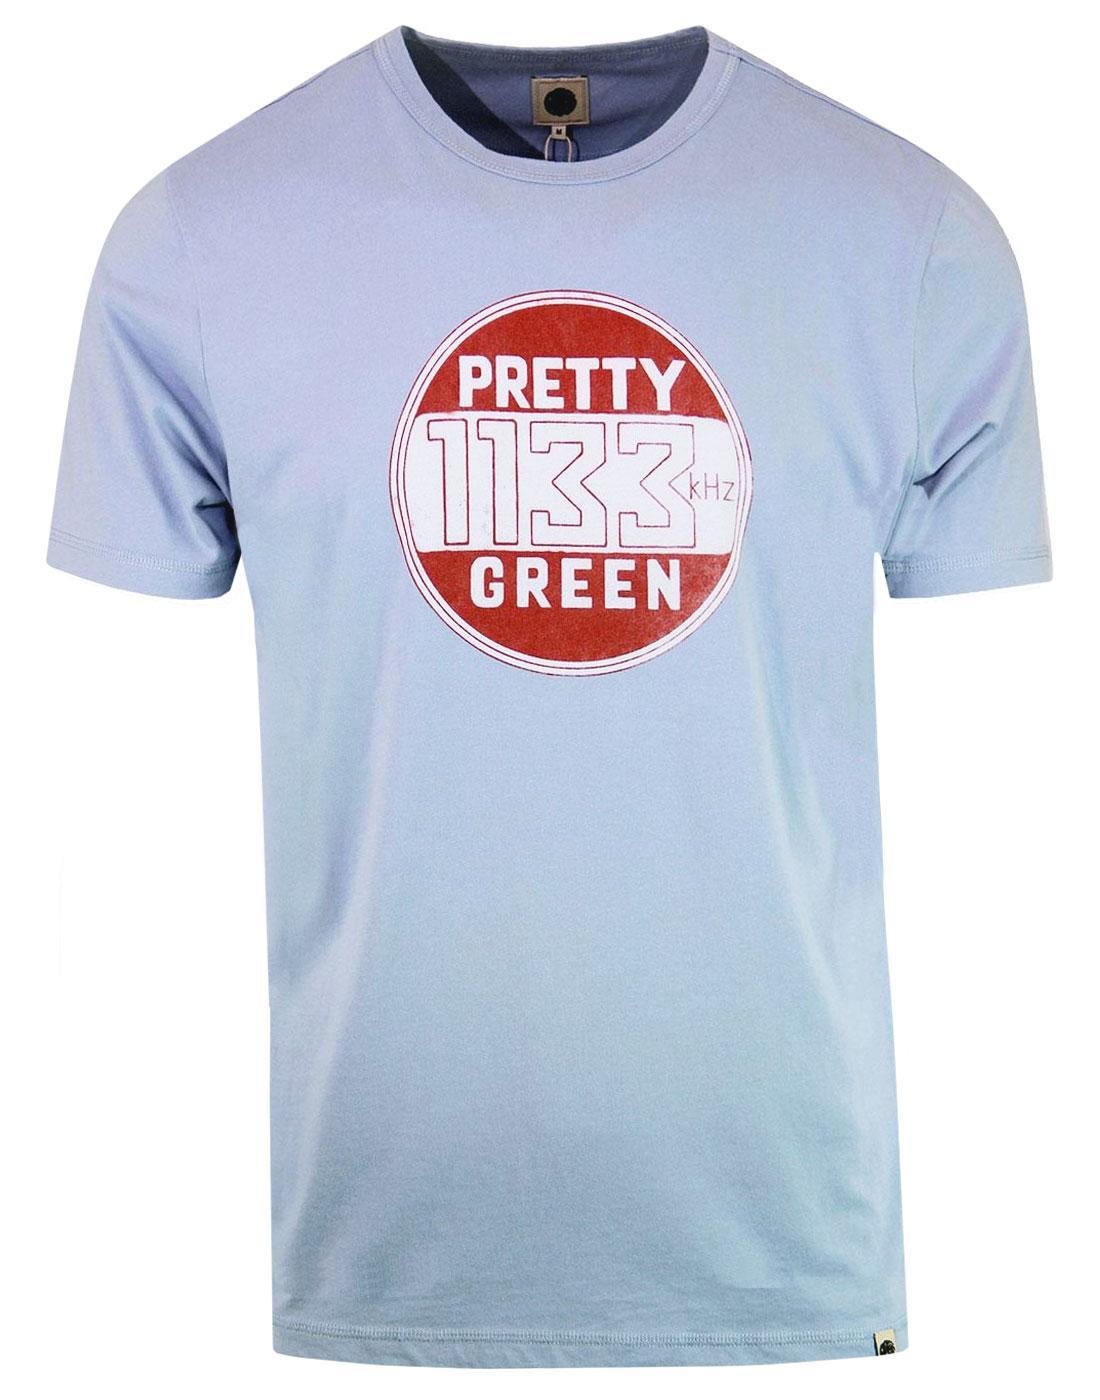 PRETTY GREEN Retro Mod Vintage Badge Print Tee